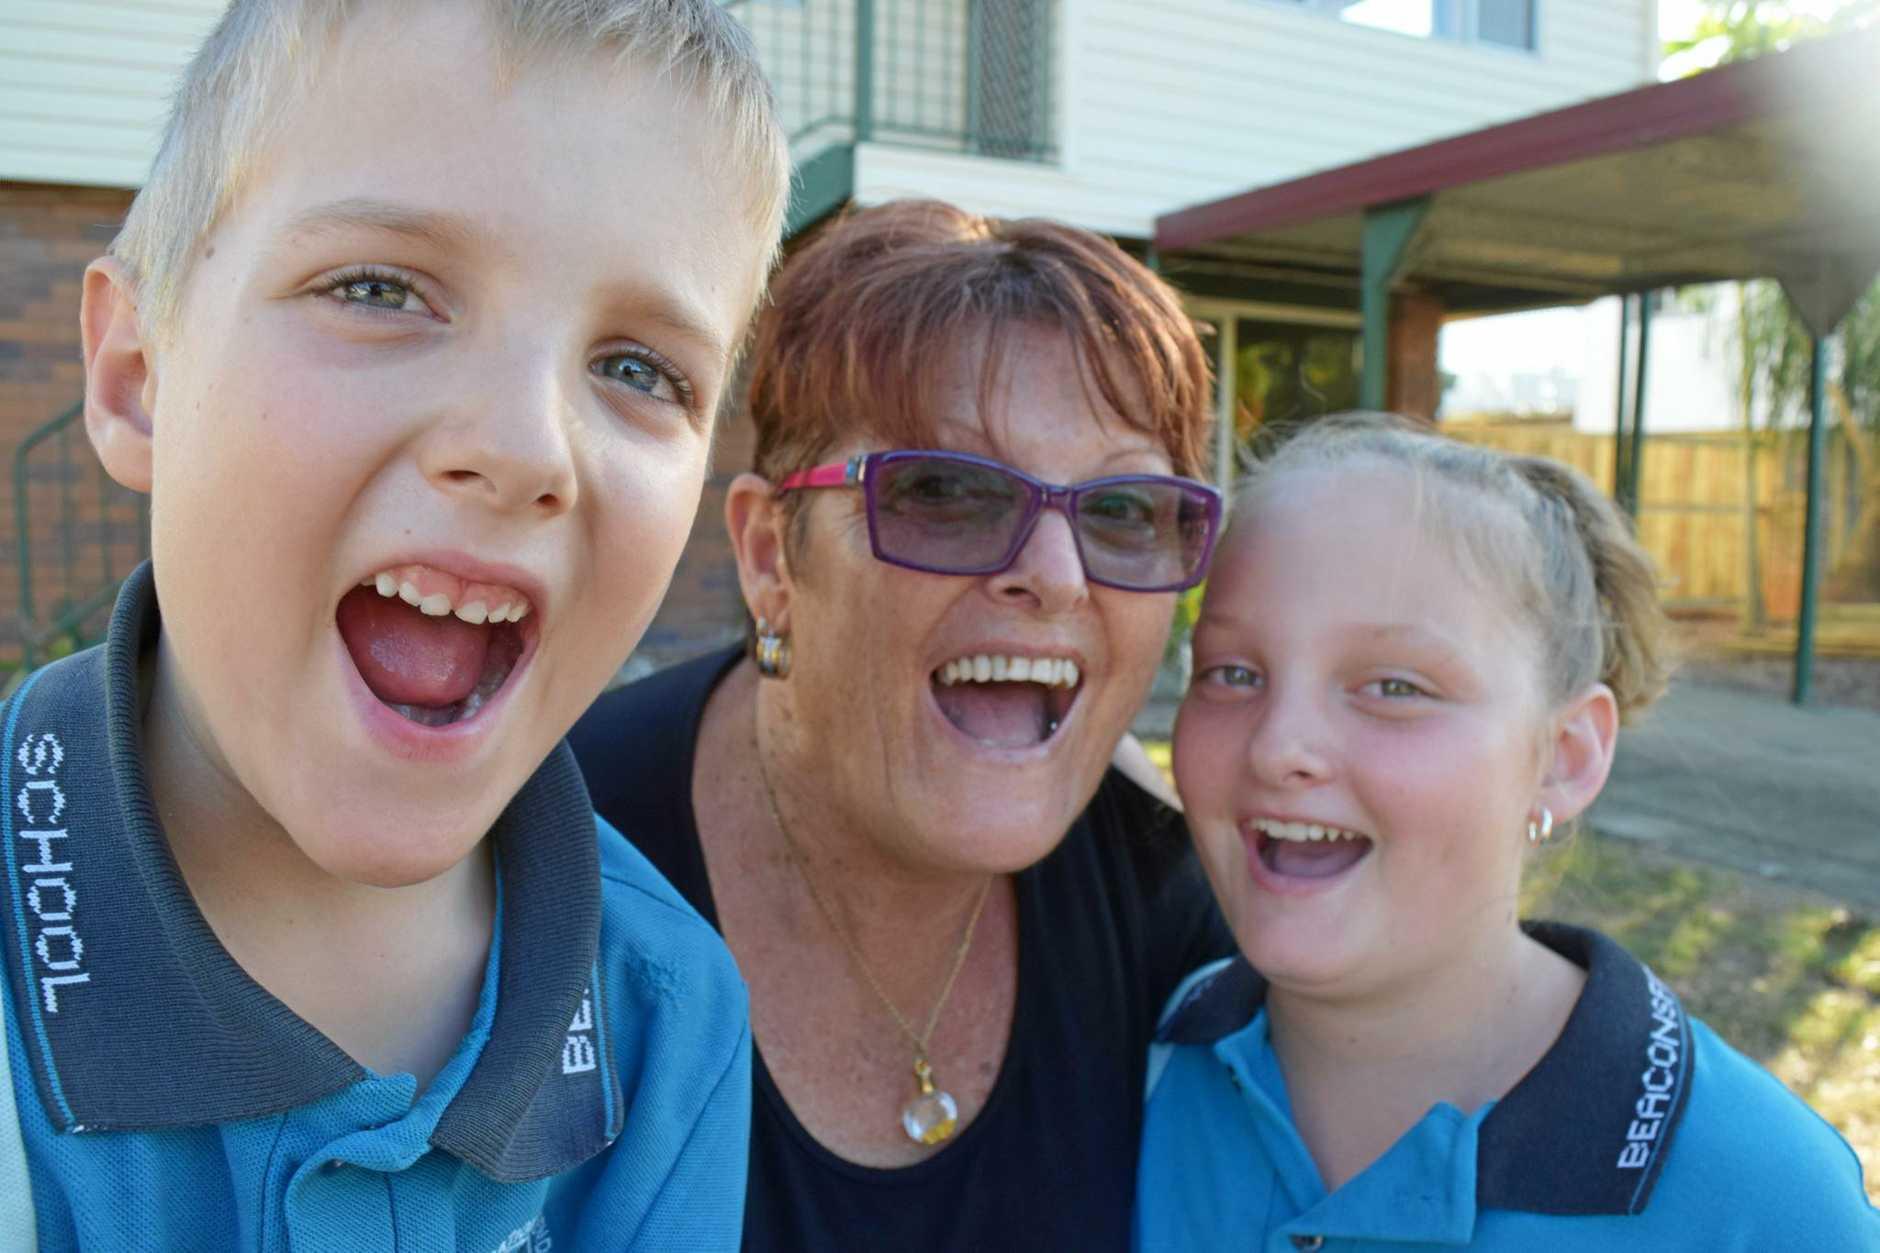 Logan Szkurda, 7, Dorothey Ramsamy, Eric Szkurda, 10, outside the family's new home in Beaconsfield